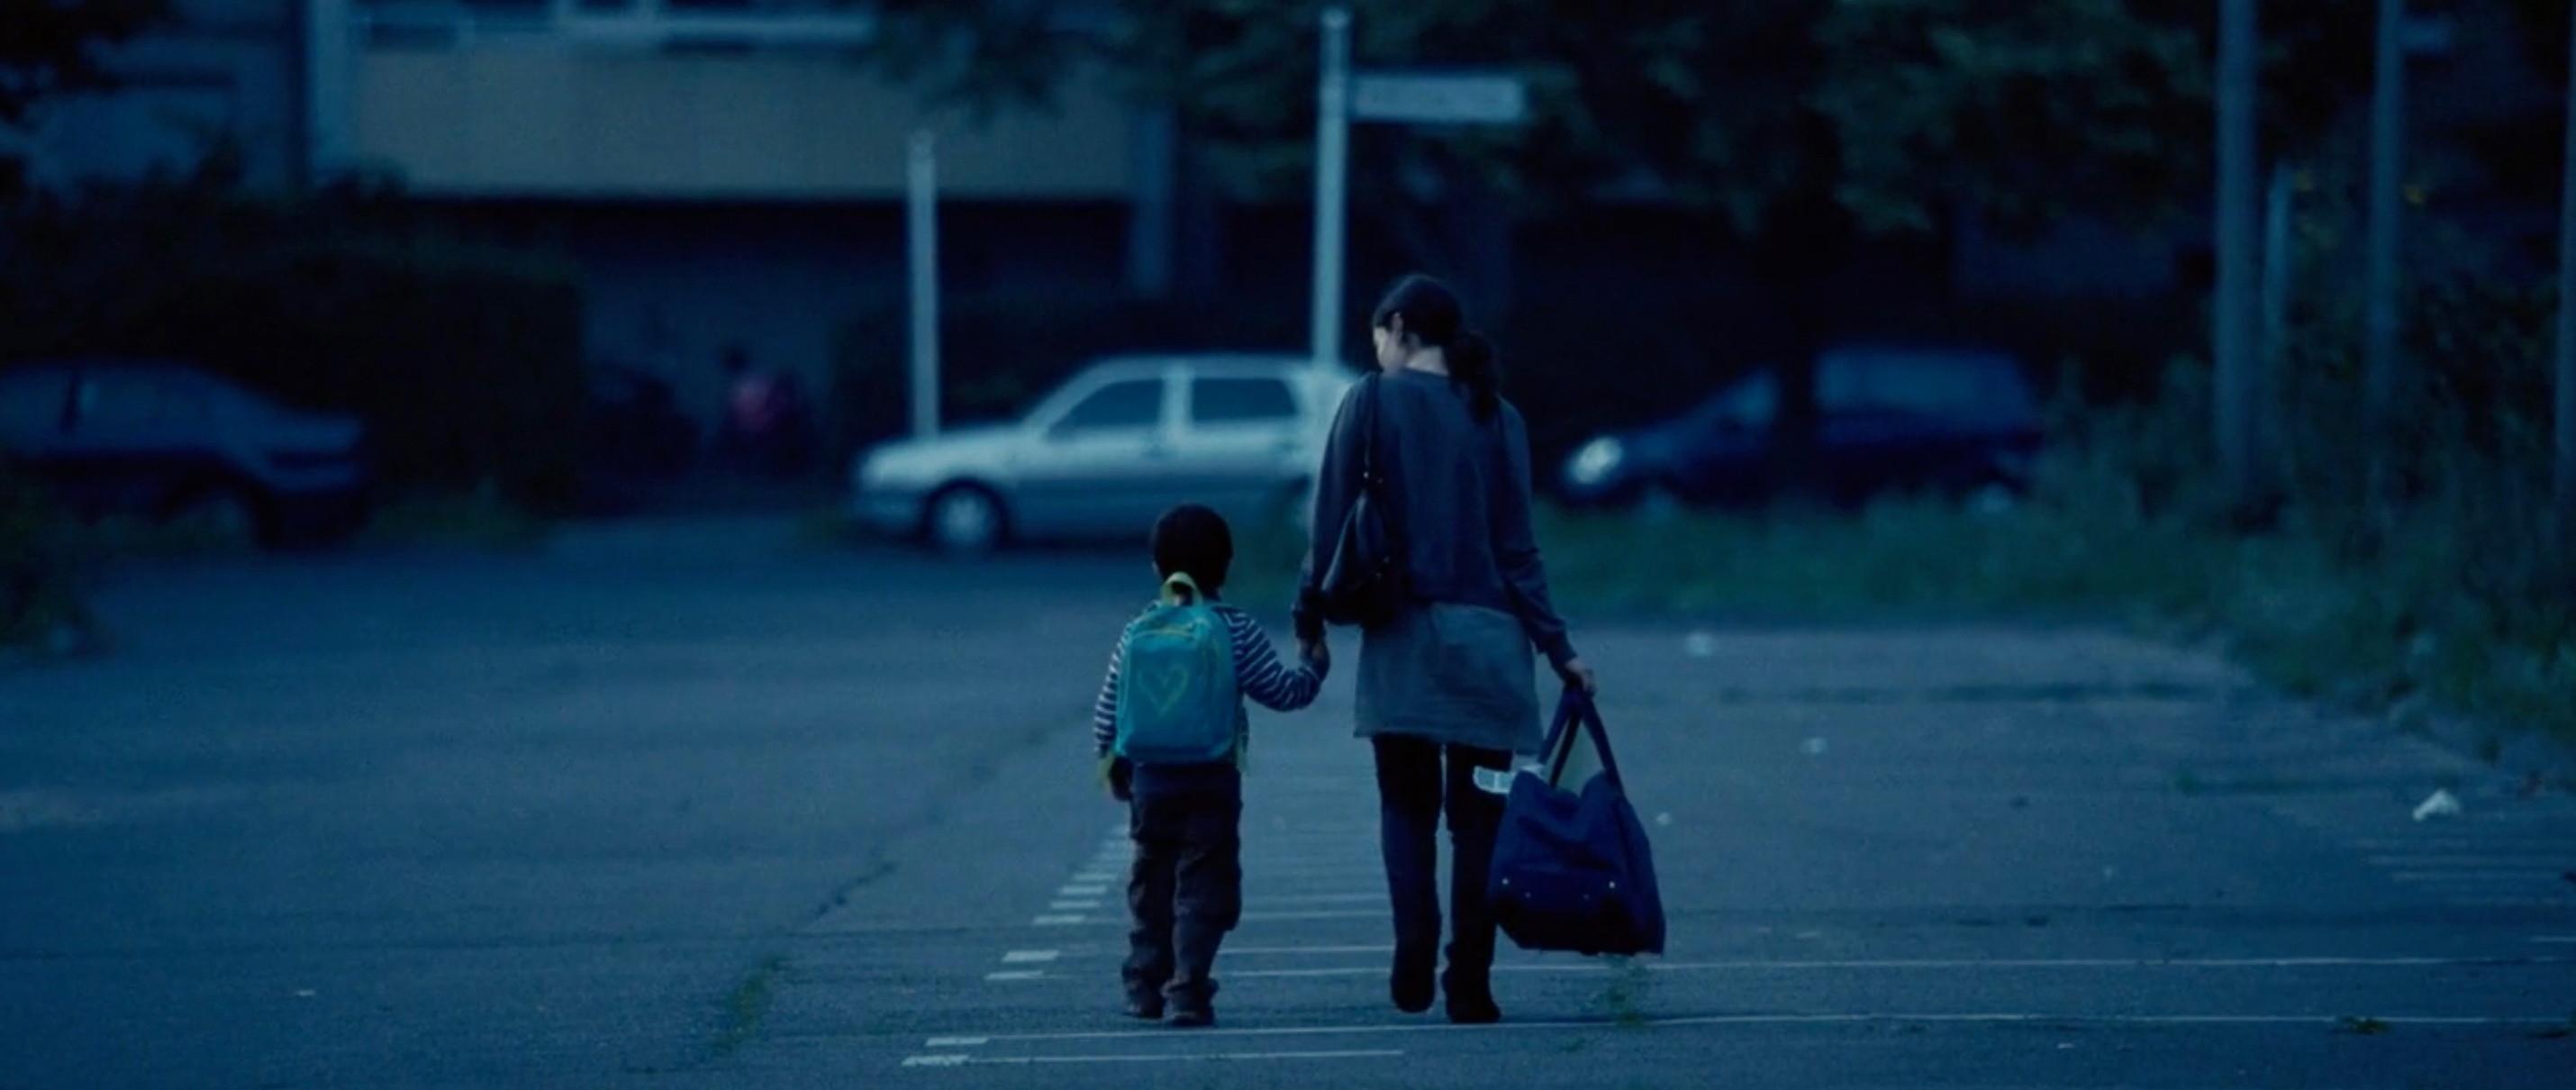 Die Fremde - When We Leave - Umay flüchtet mit Cem - Regie: Feo Aladag - Kamera Judith Kaufmann